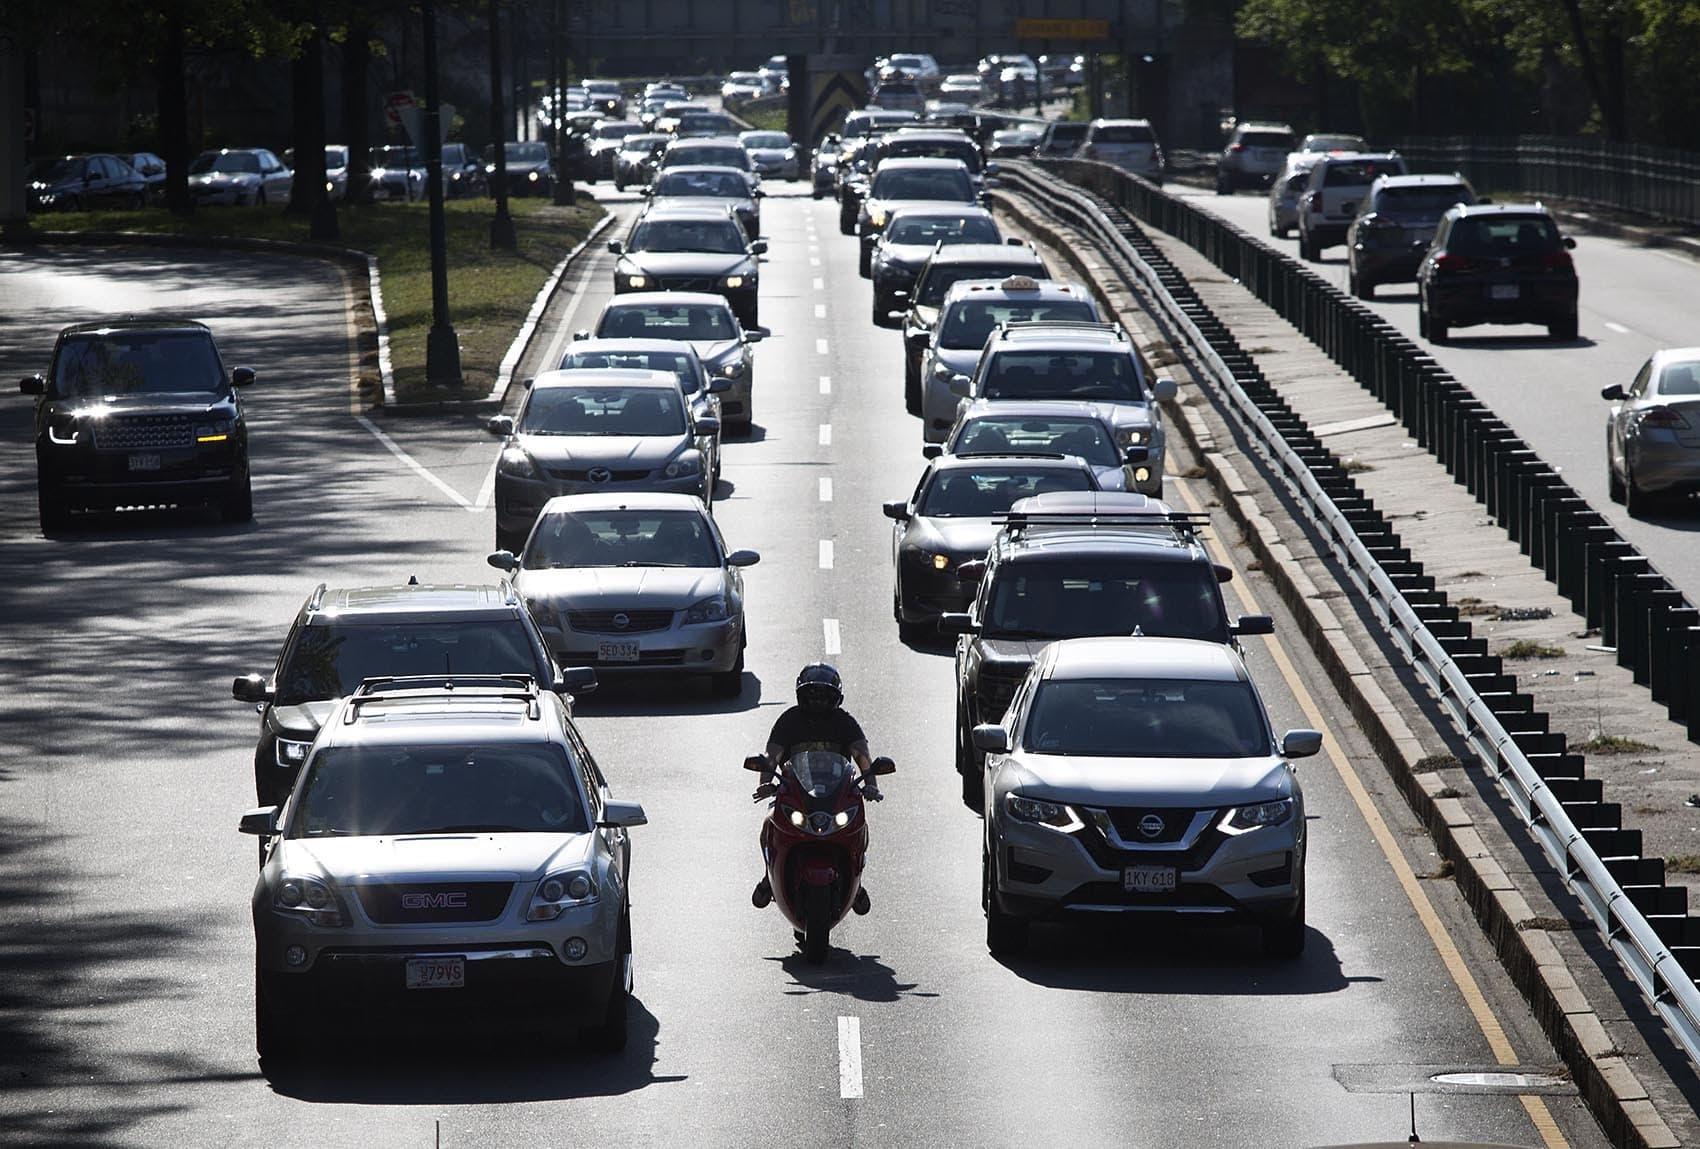 Cars crawl along Storrow Drive in Boston. (Robin Lubbock/WBUR)